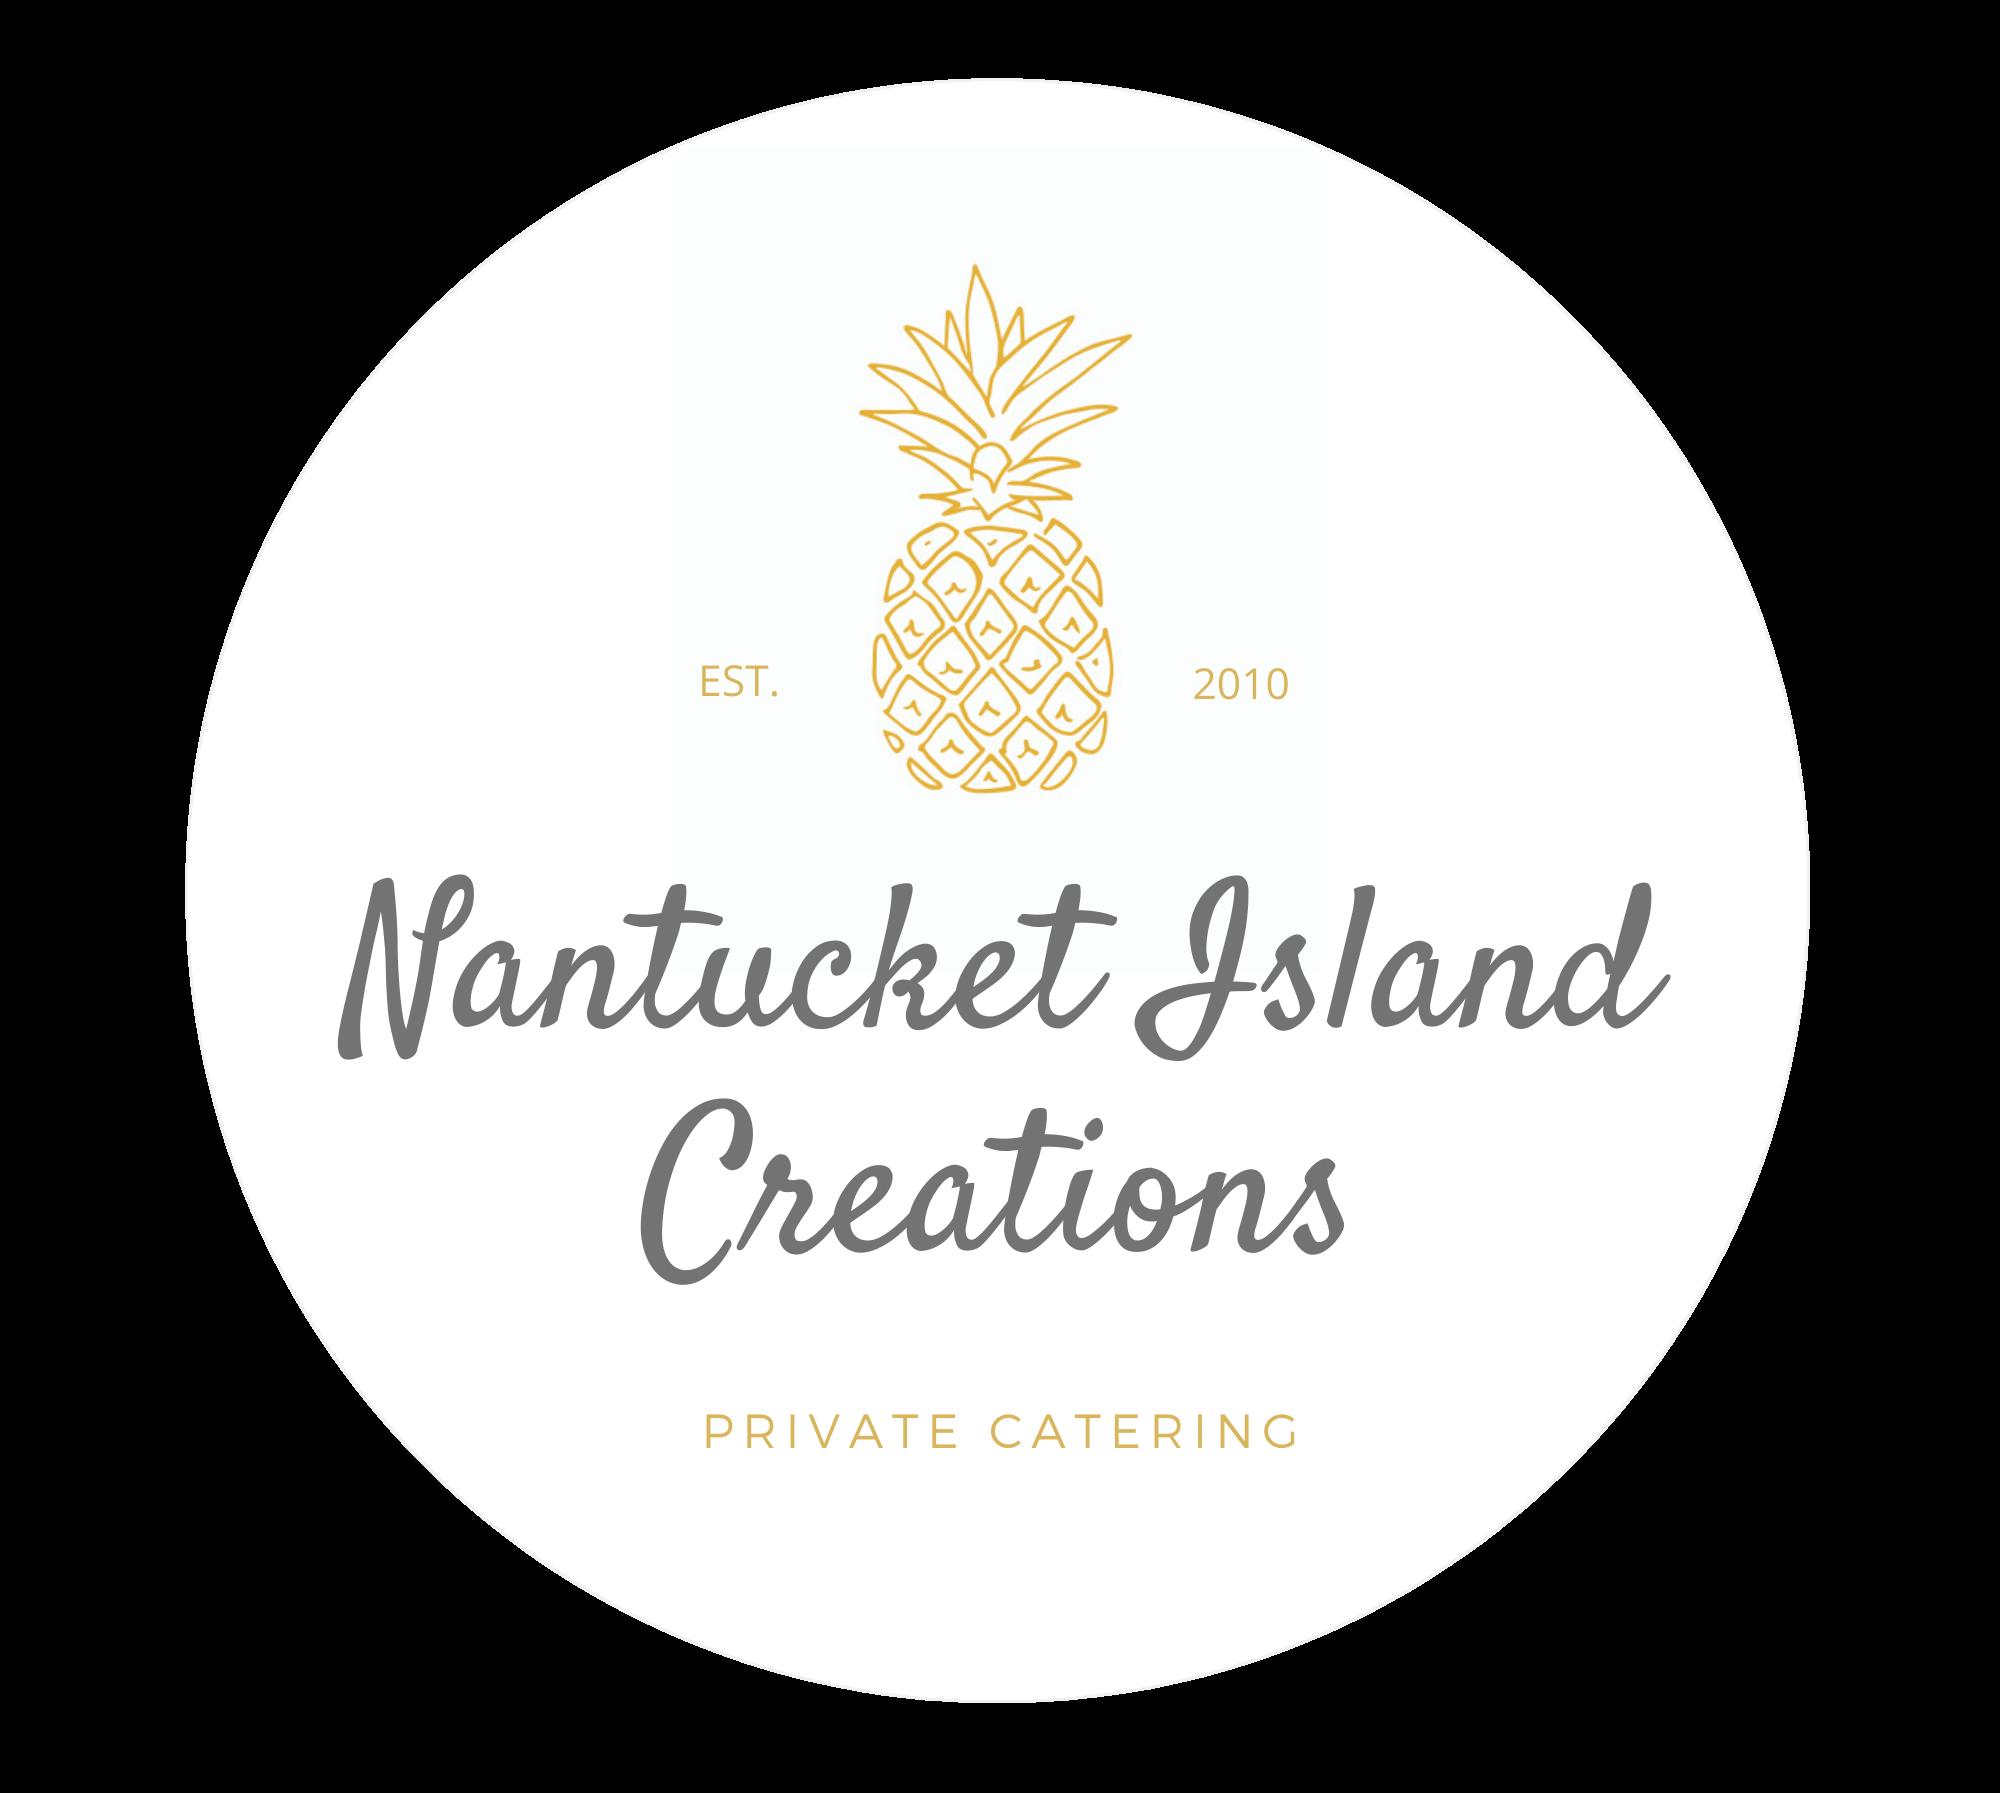 Nantucket Island Creations